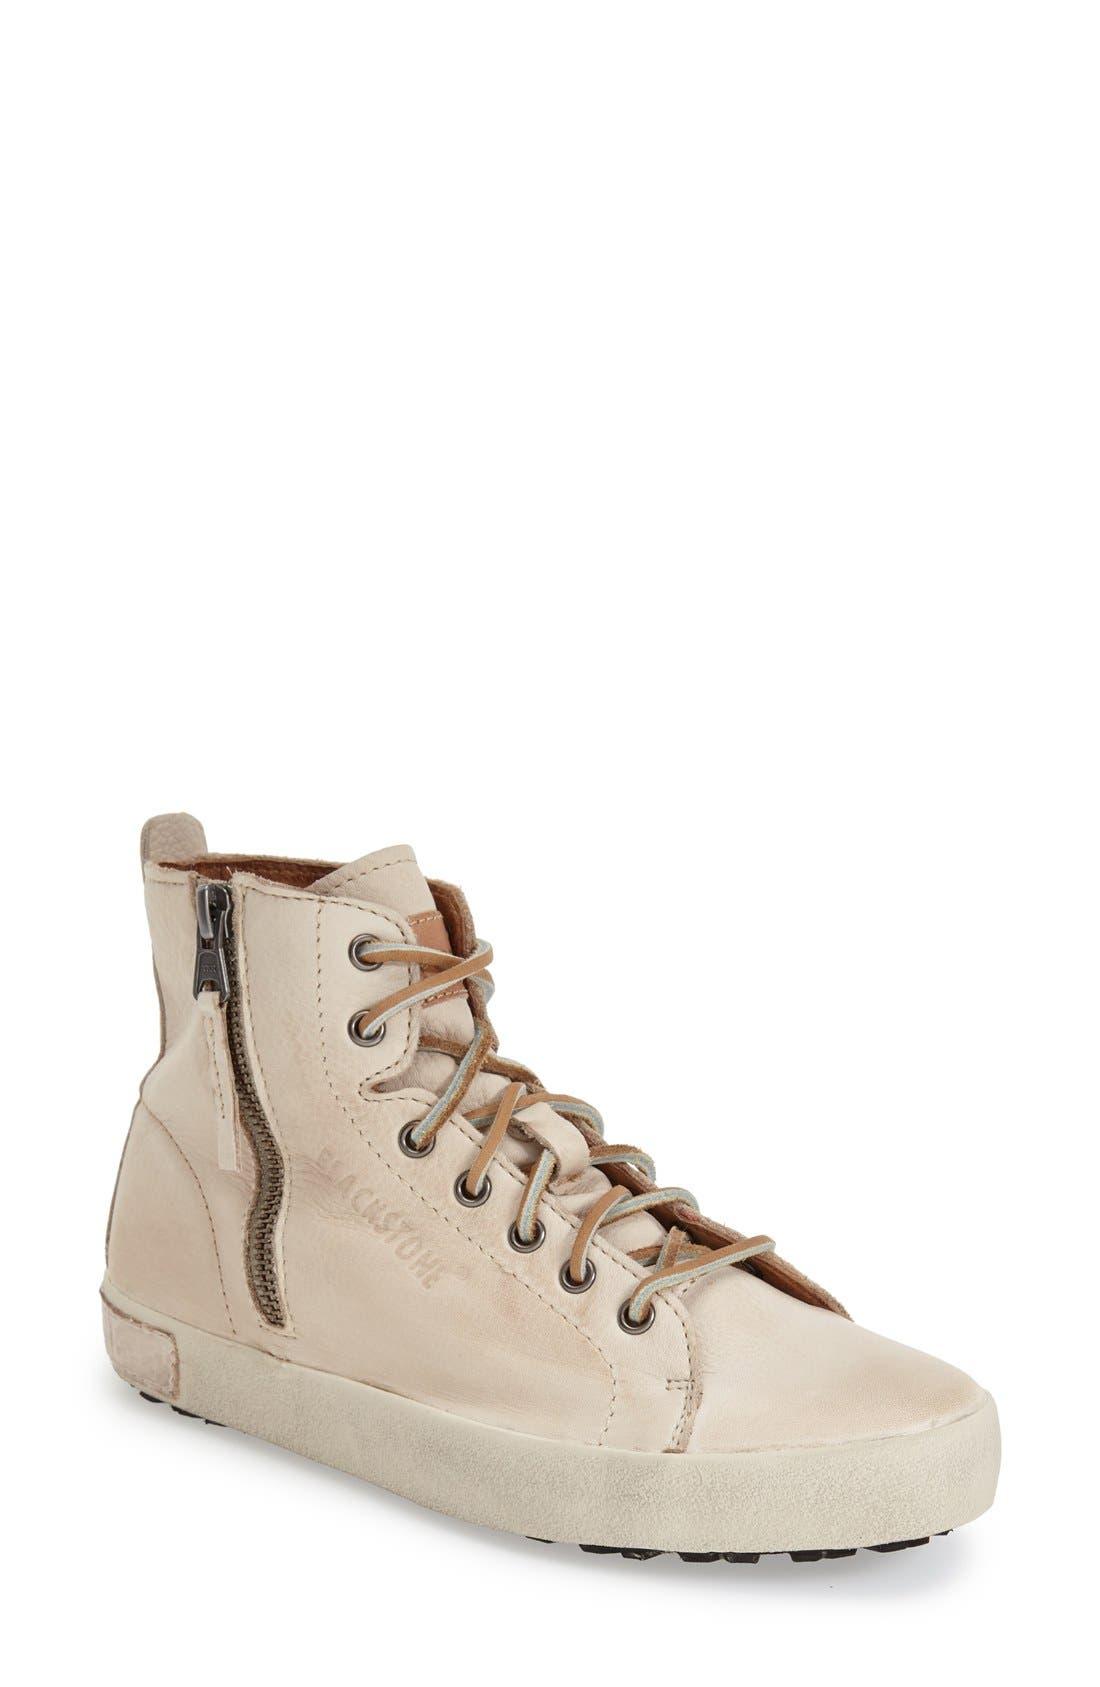 'Jl' High Top Sneaker